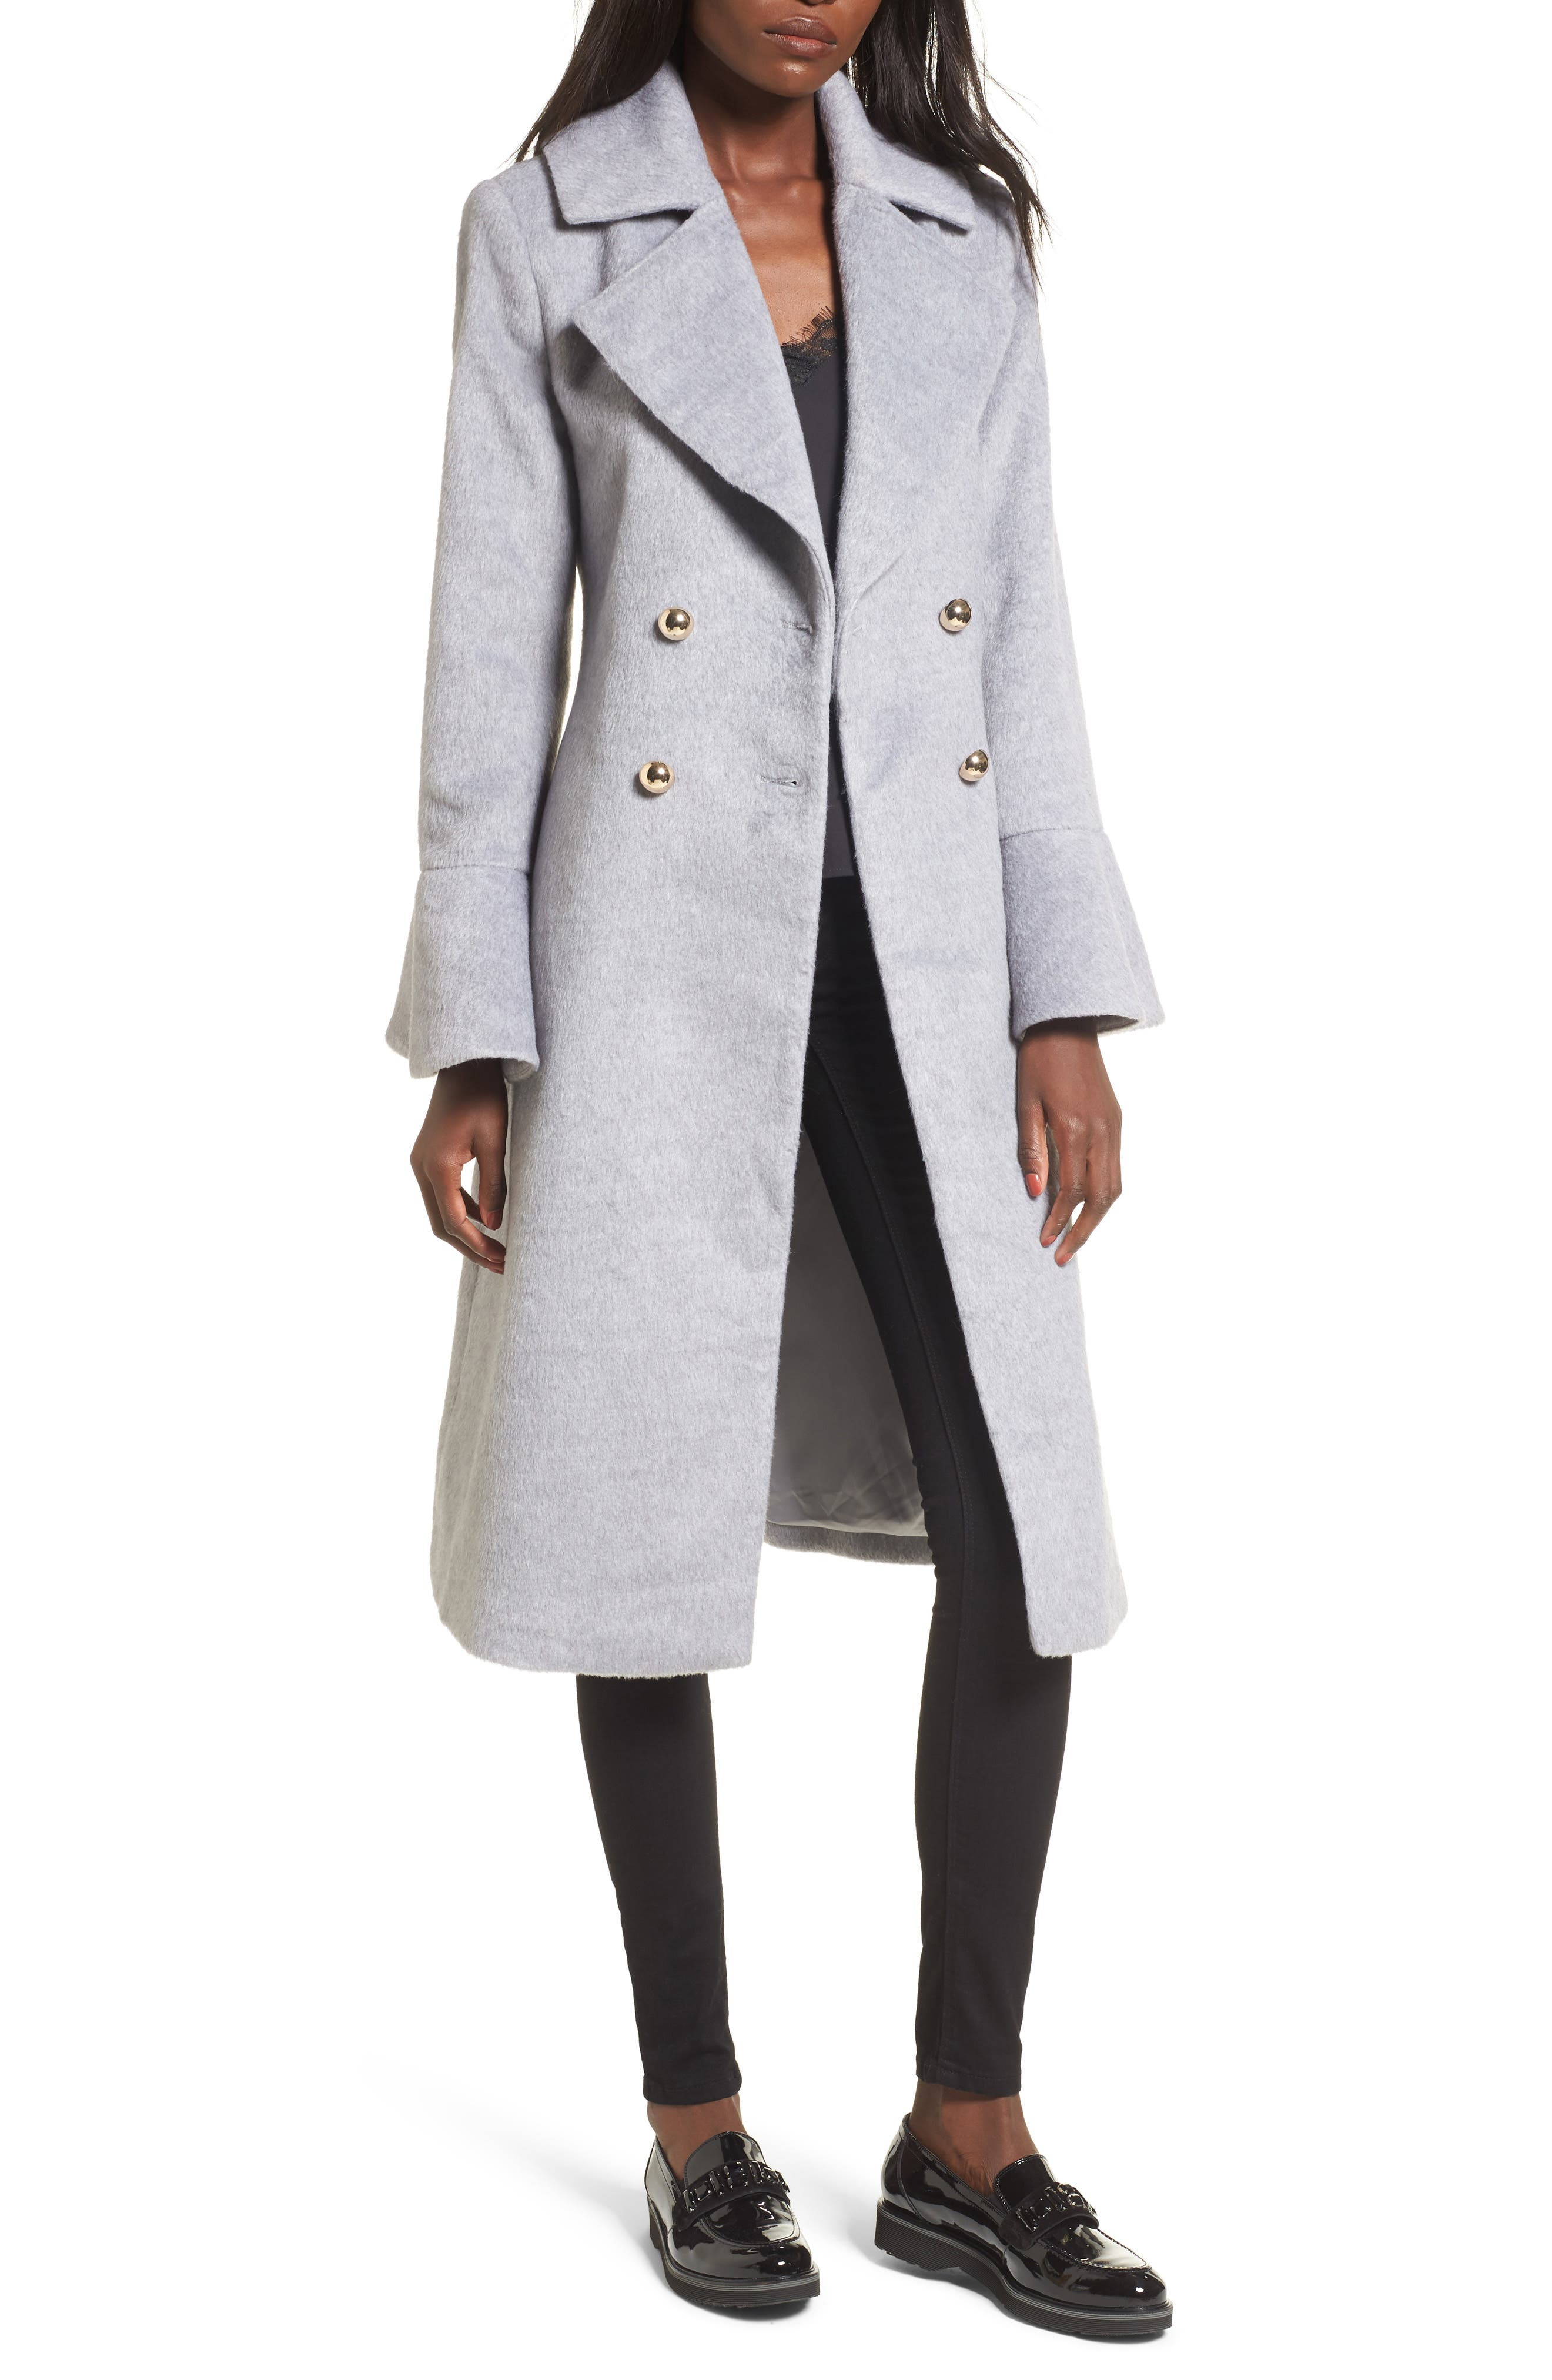 Intuition Water Repellent Coat,                         Main,                         color, Grey